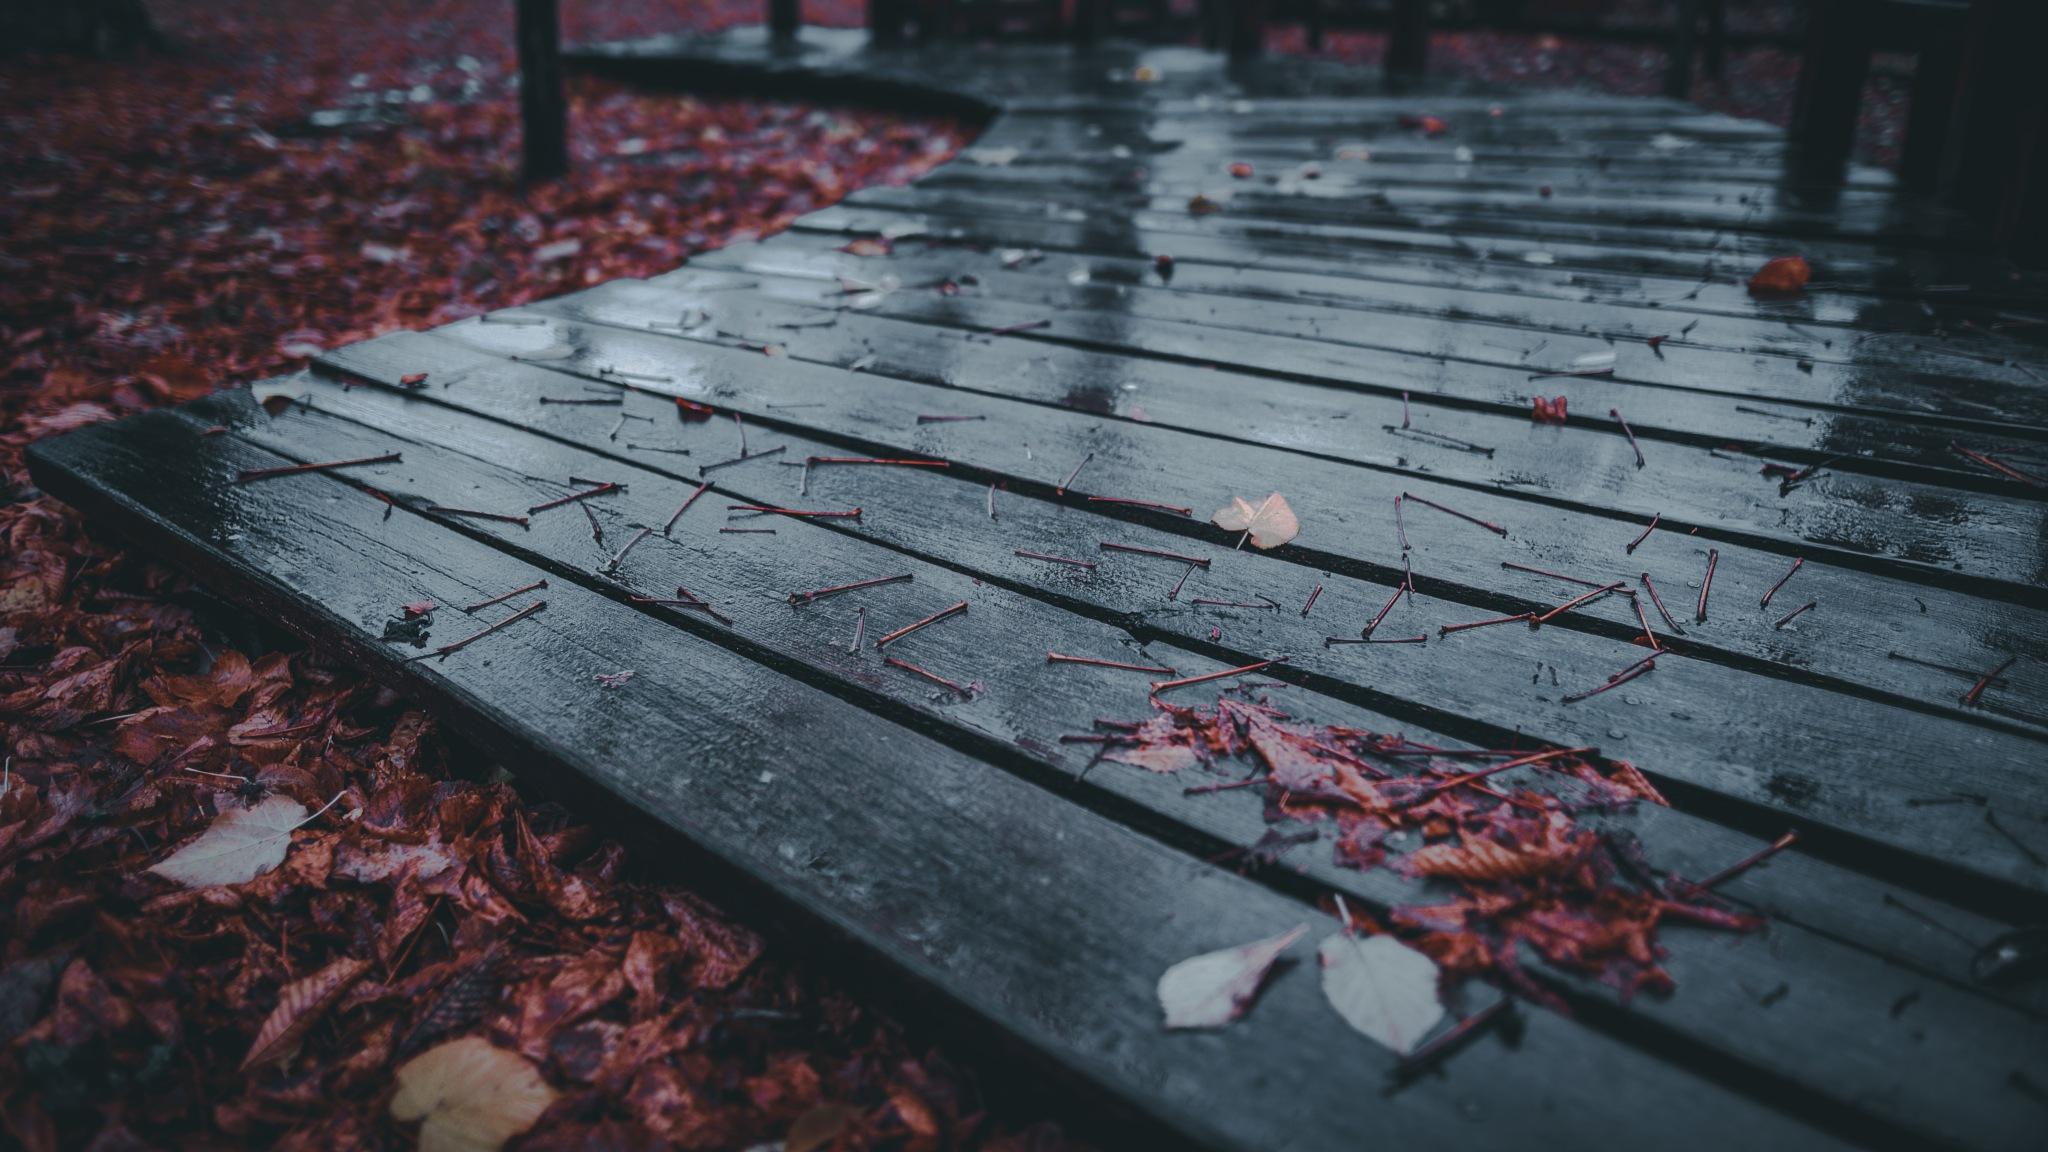 rainy day by Robert Mikk